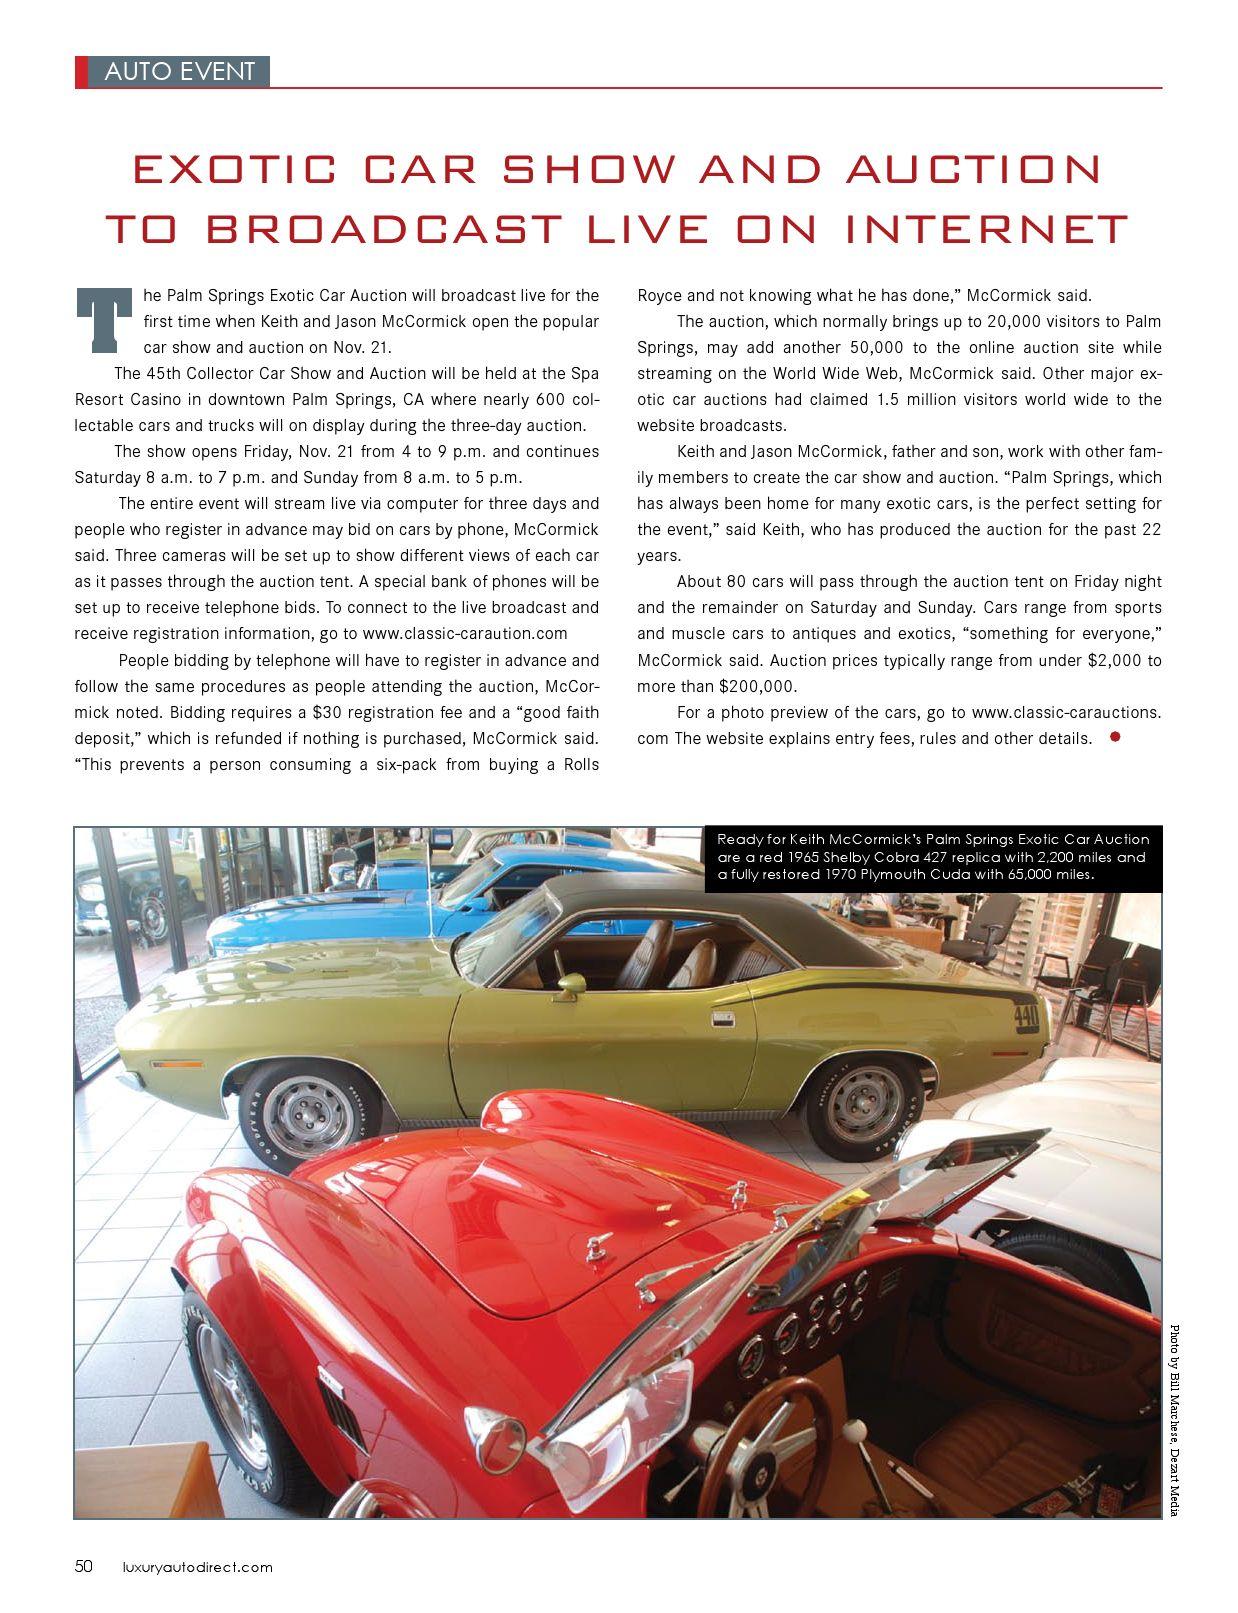 Luxury Auto Direct By LuxuryAutoDirectcom Issuu - Palm springs classic car show